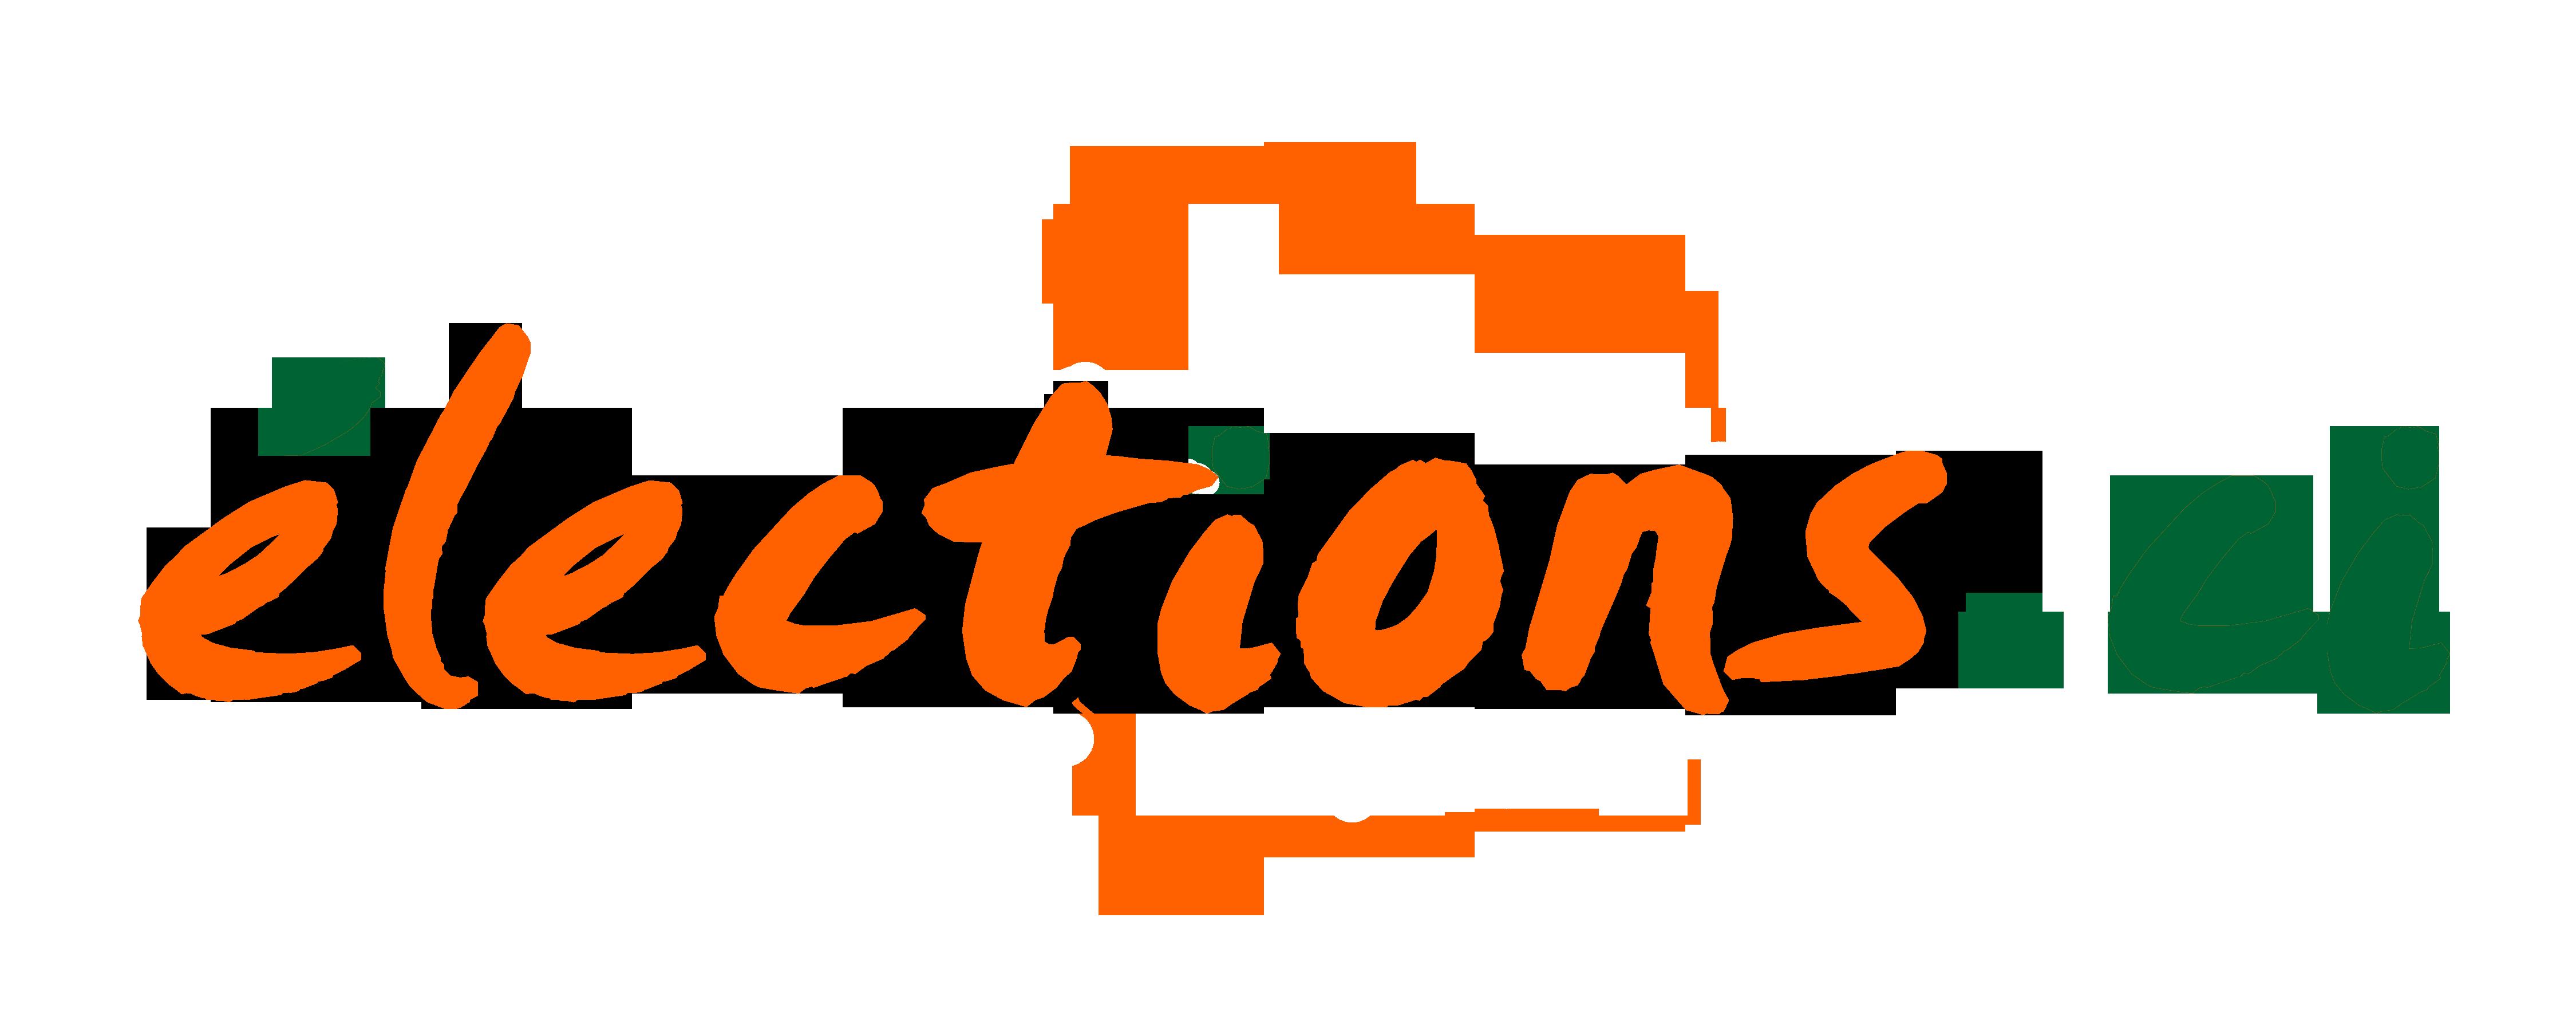 Elections.ci